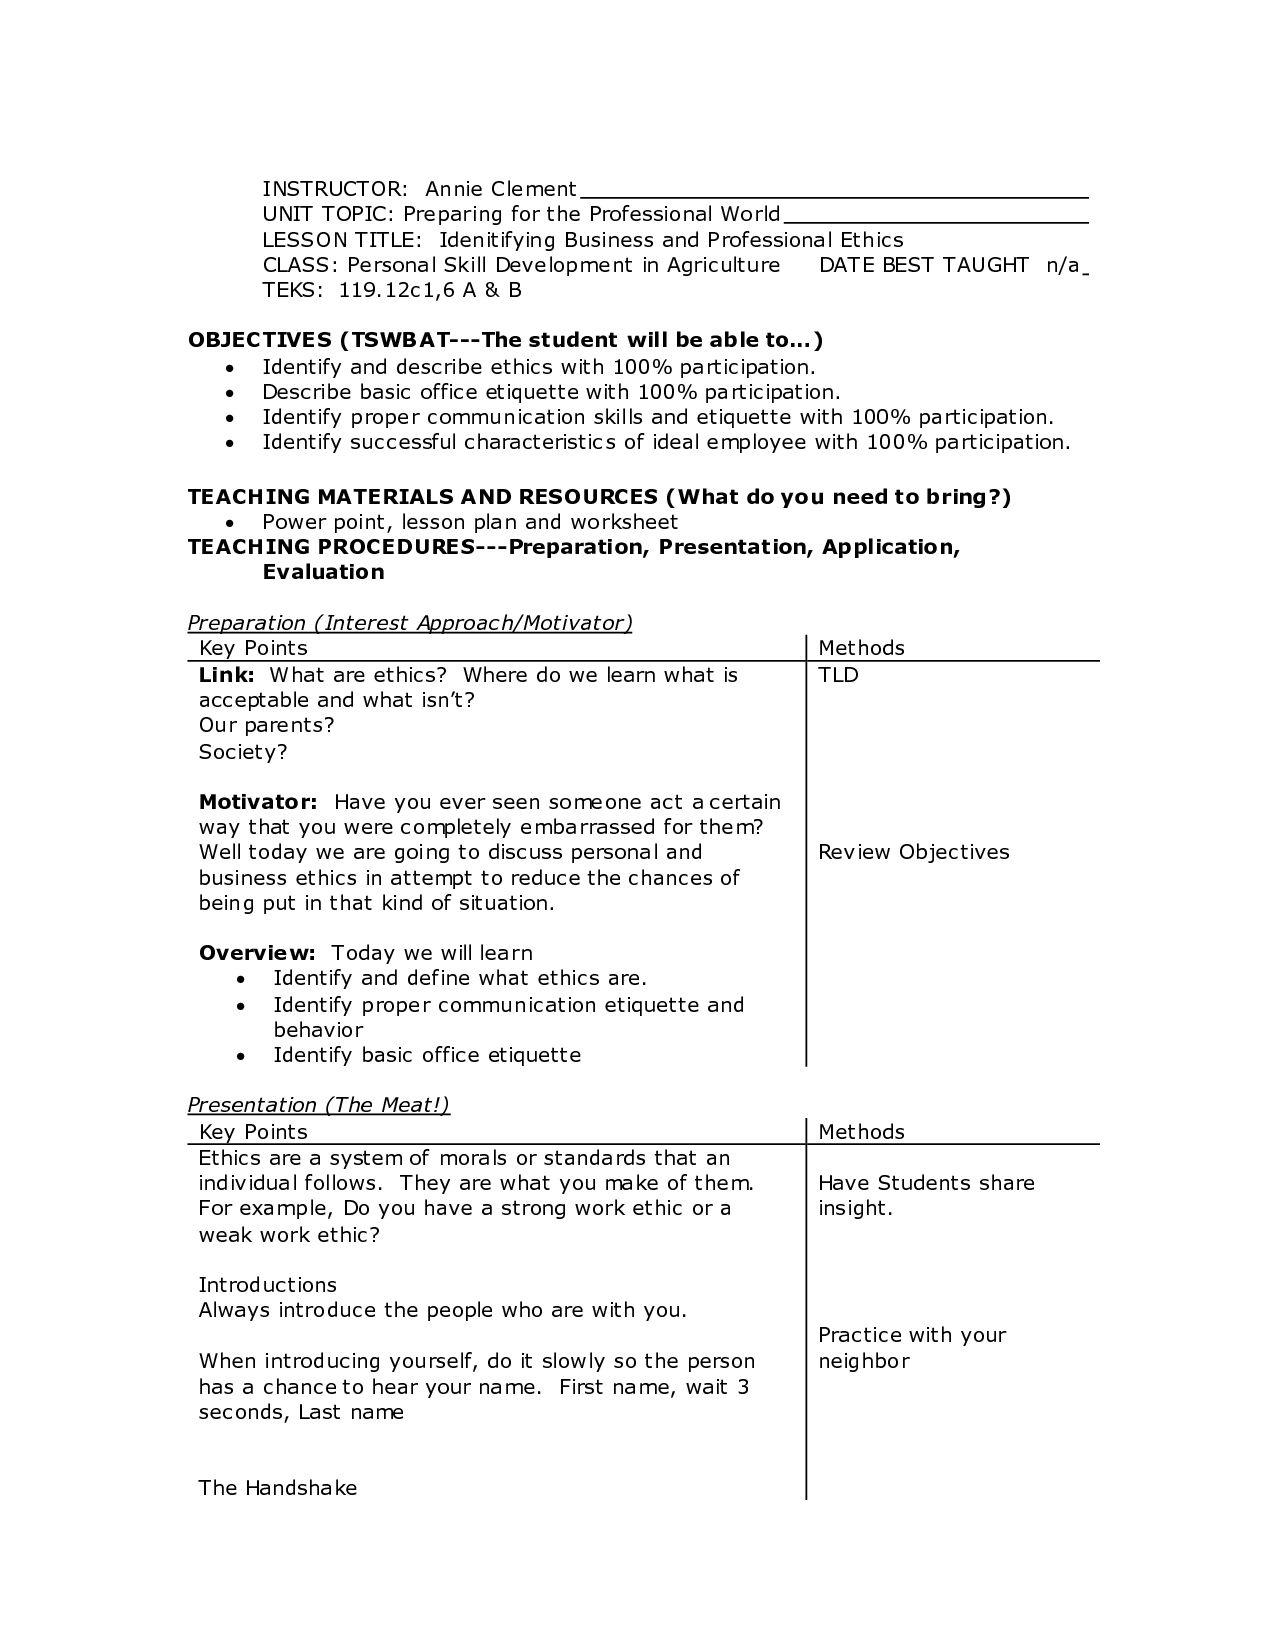 build resume online resume builder 2